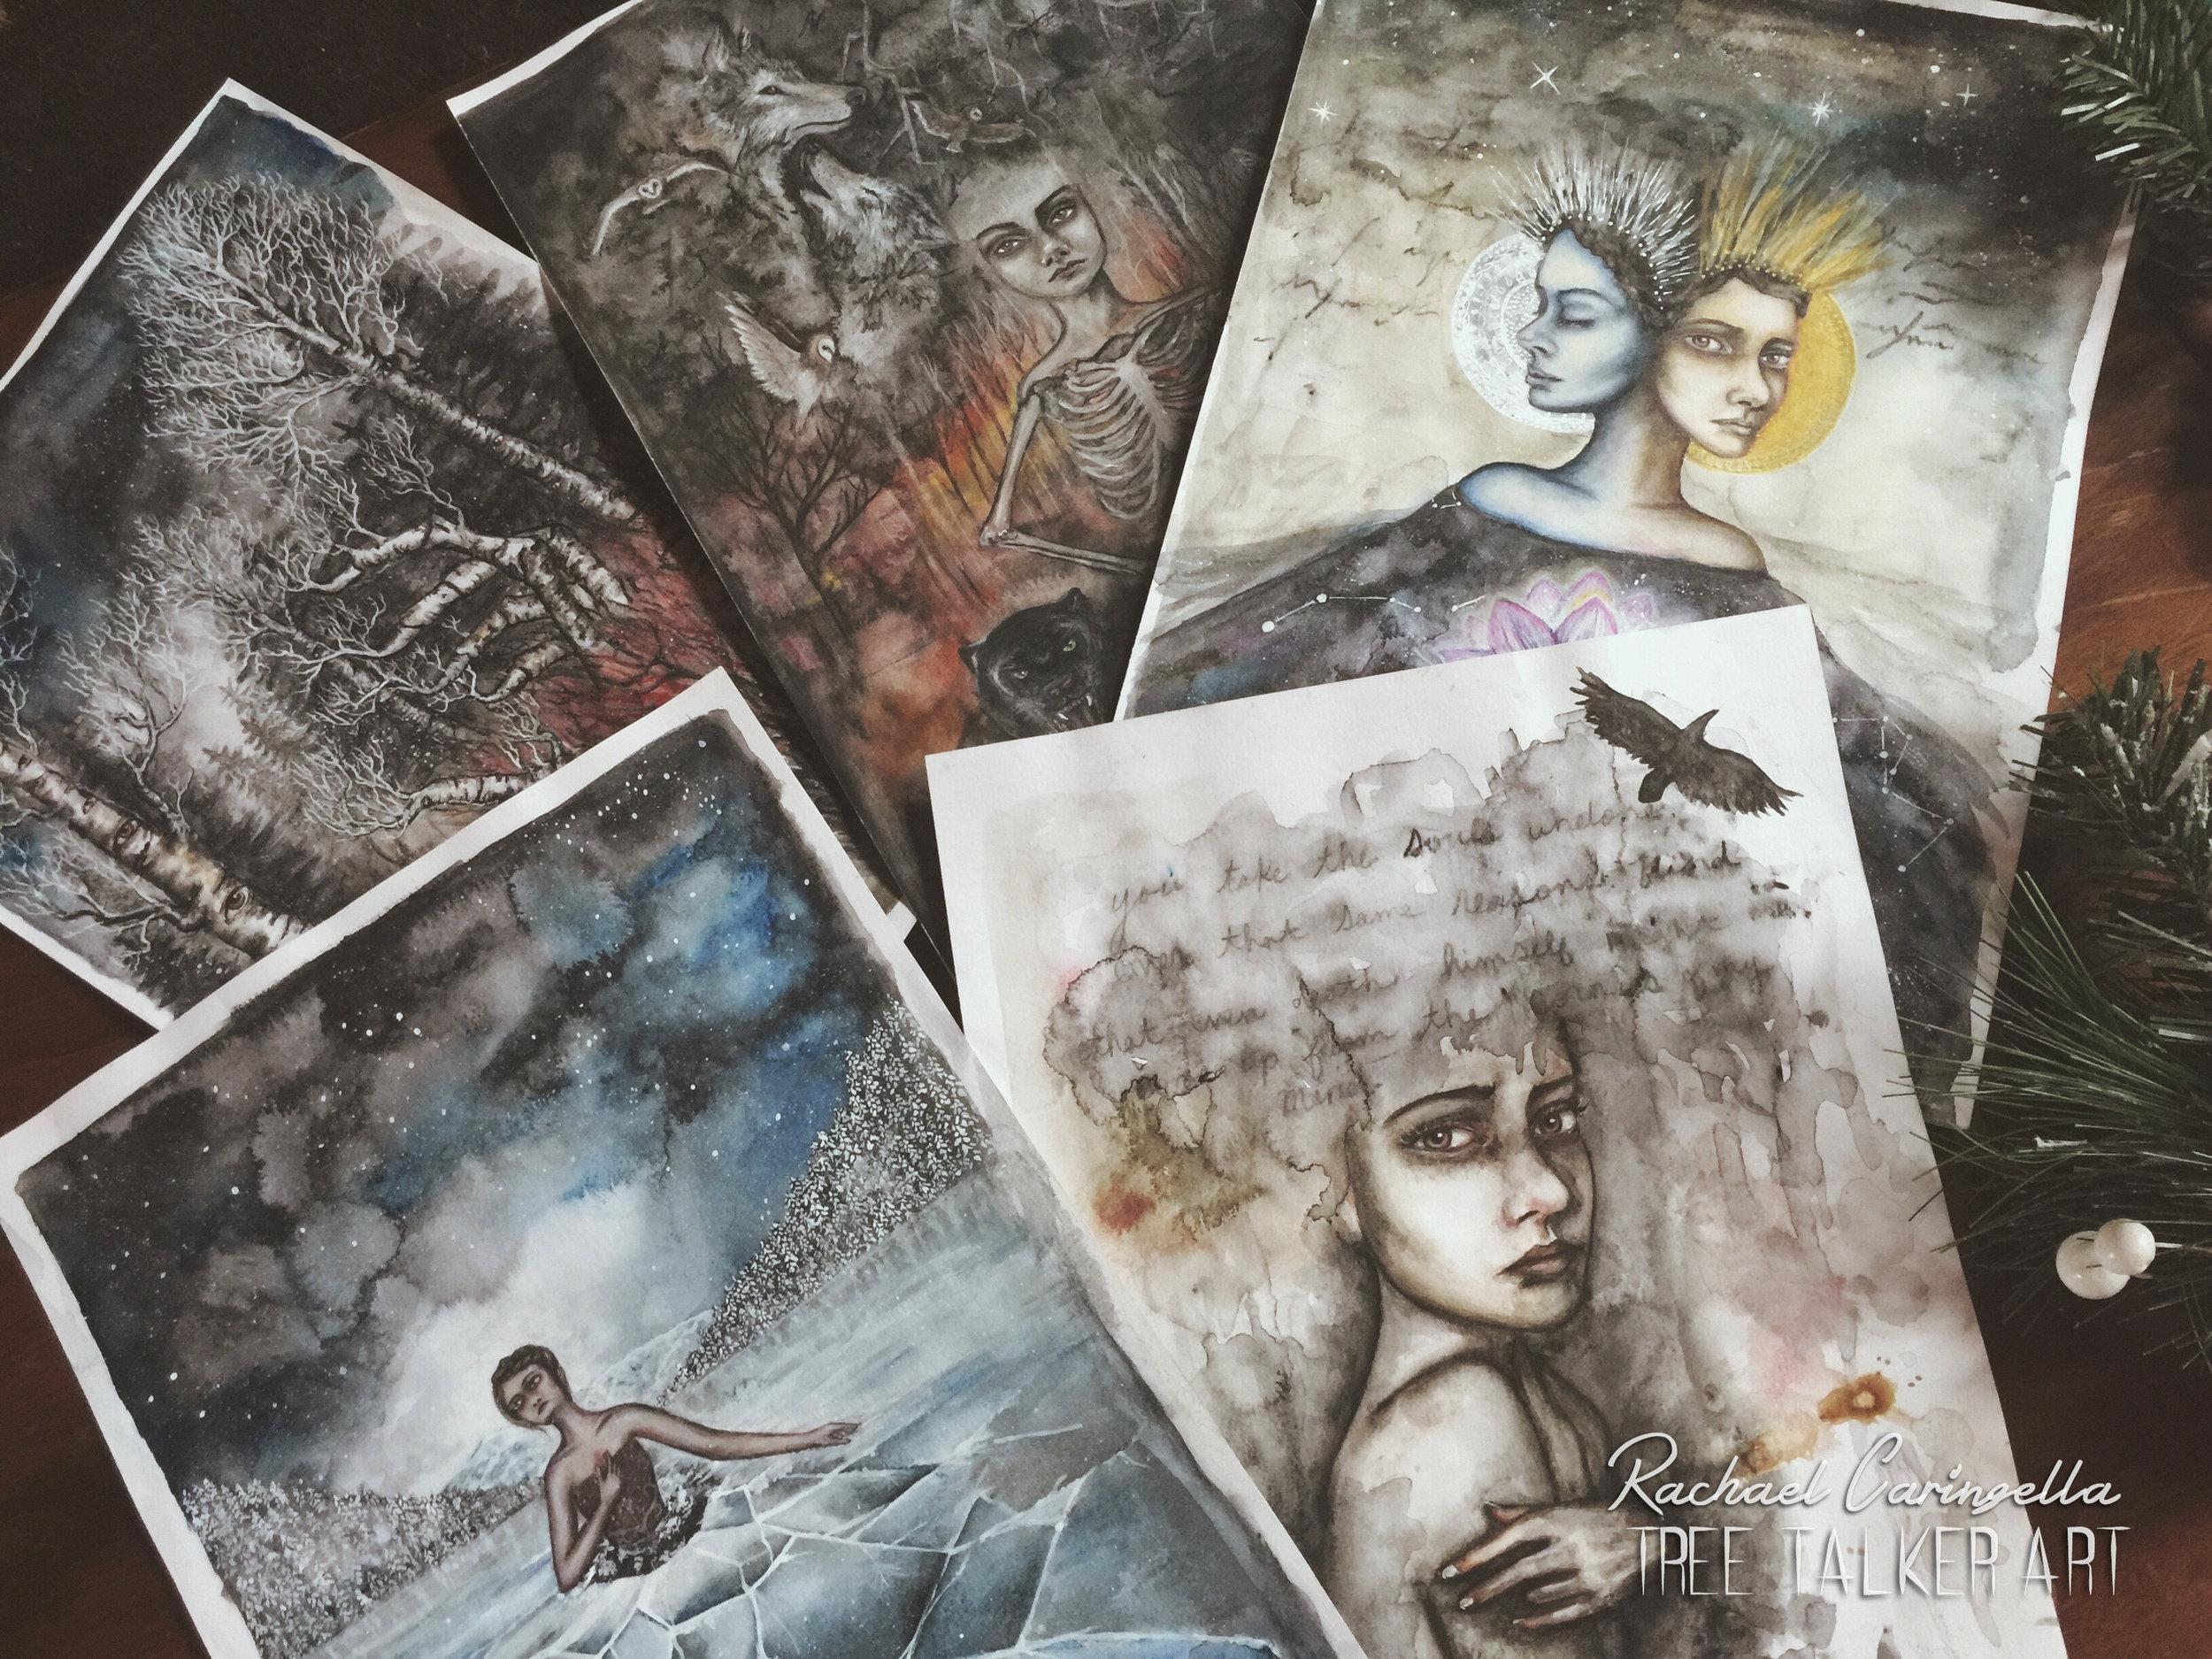 Art Journaling With Rachael Caringella of Tree Talker Art